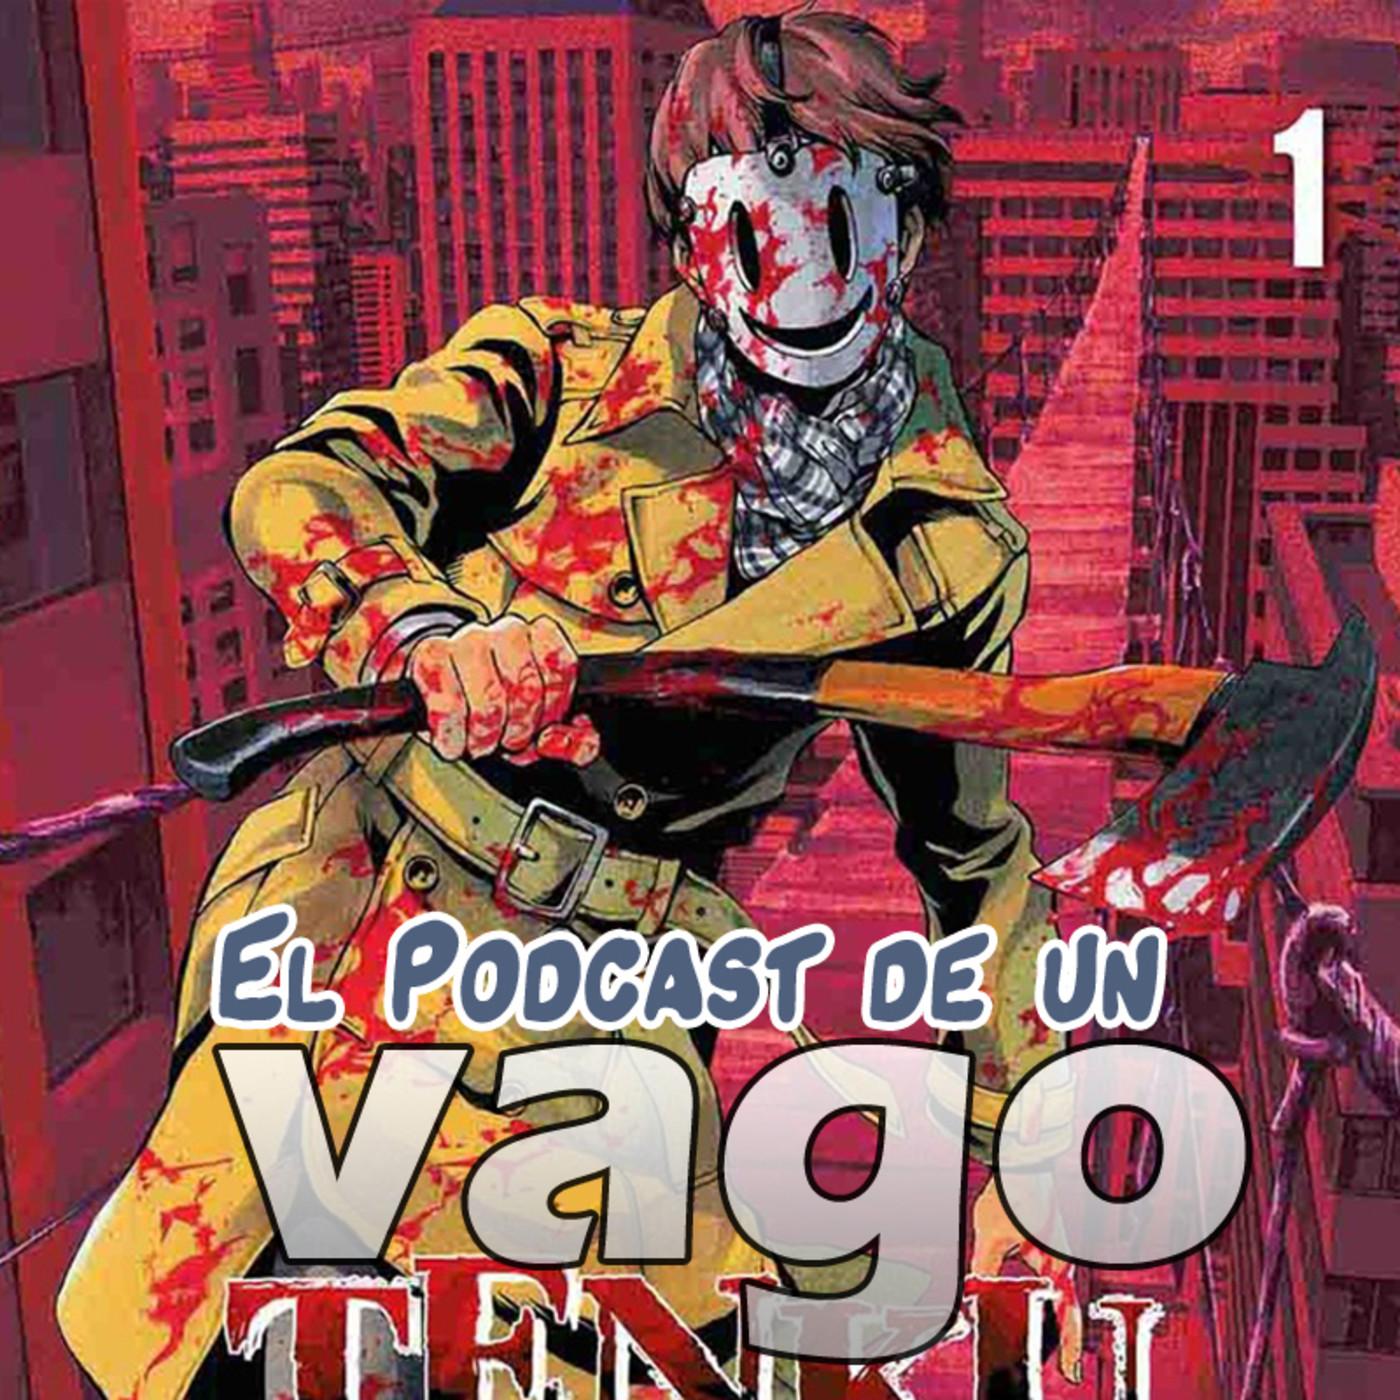 VagoPodcast #73: Noticias y Tenkuu Shinpan